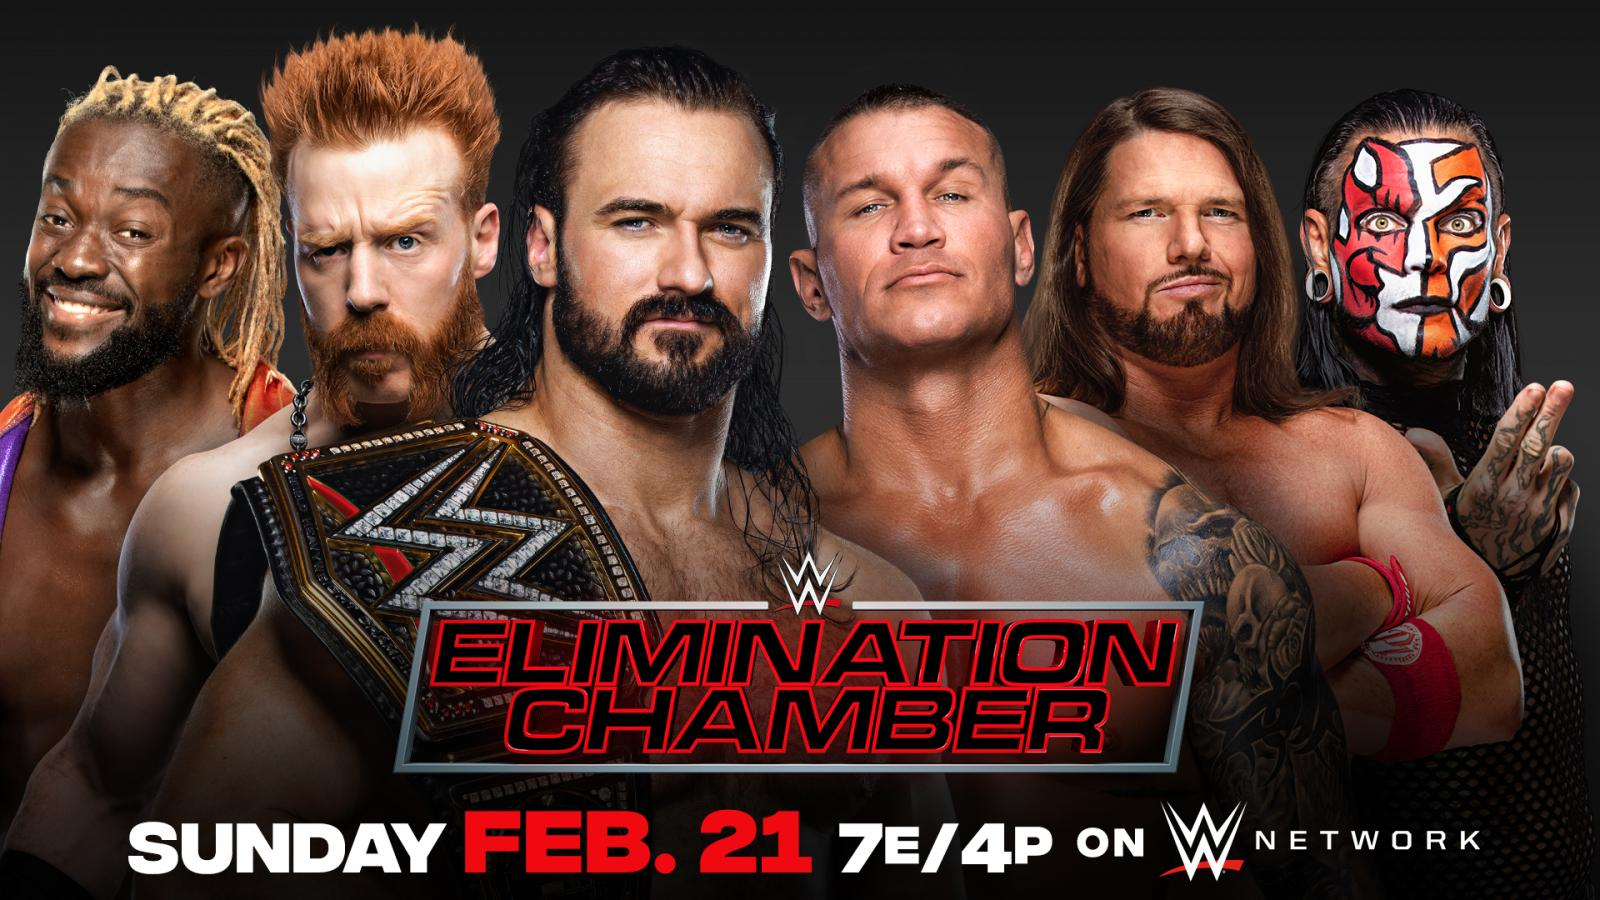 WWE Championship Elimination Chamber Match 2021 Kofi Kingston Sheamus Drew McIntyre Randy Orton AJ Styles Jeff Hardy